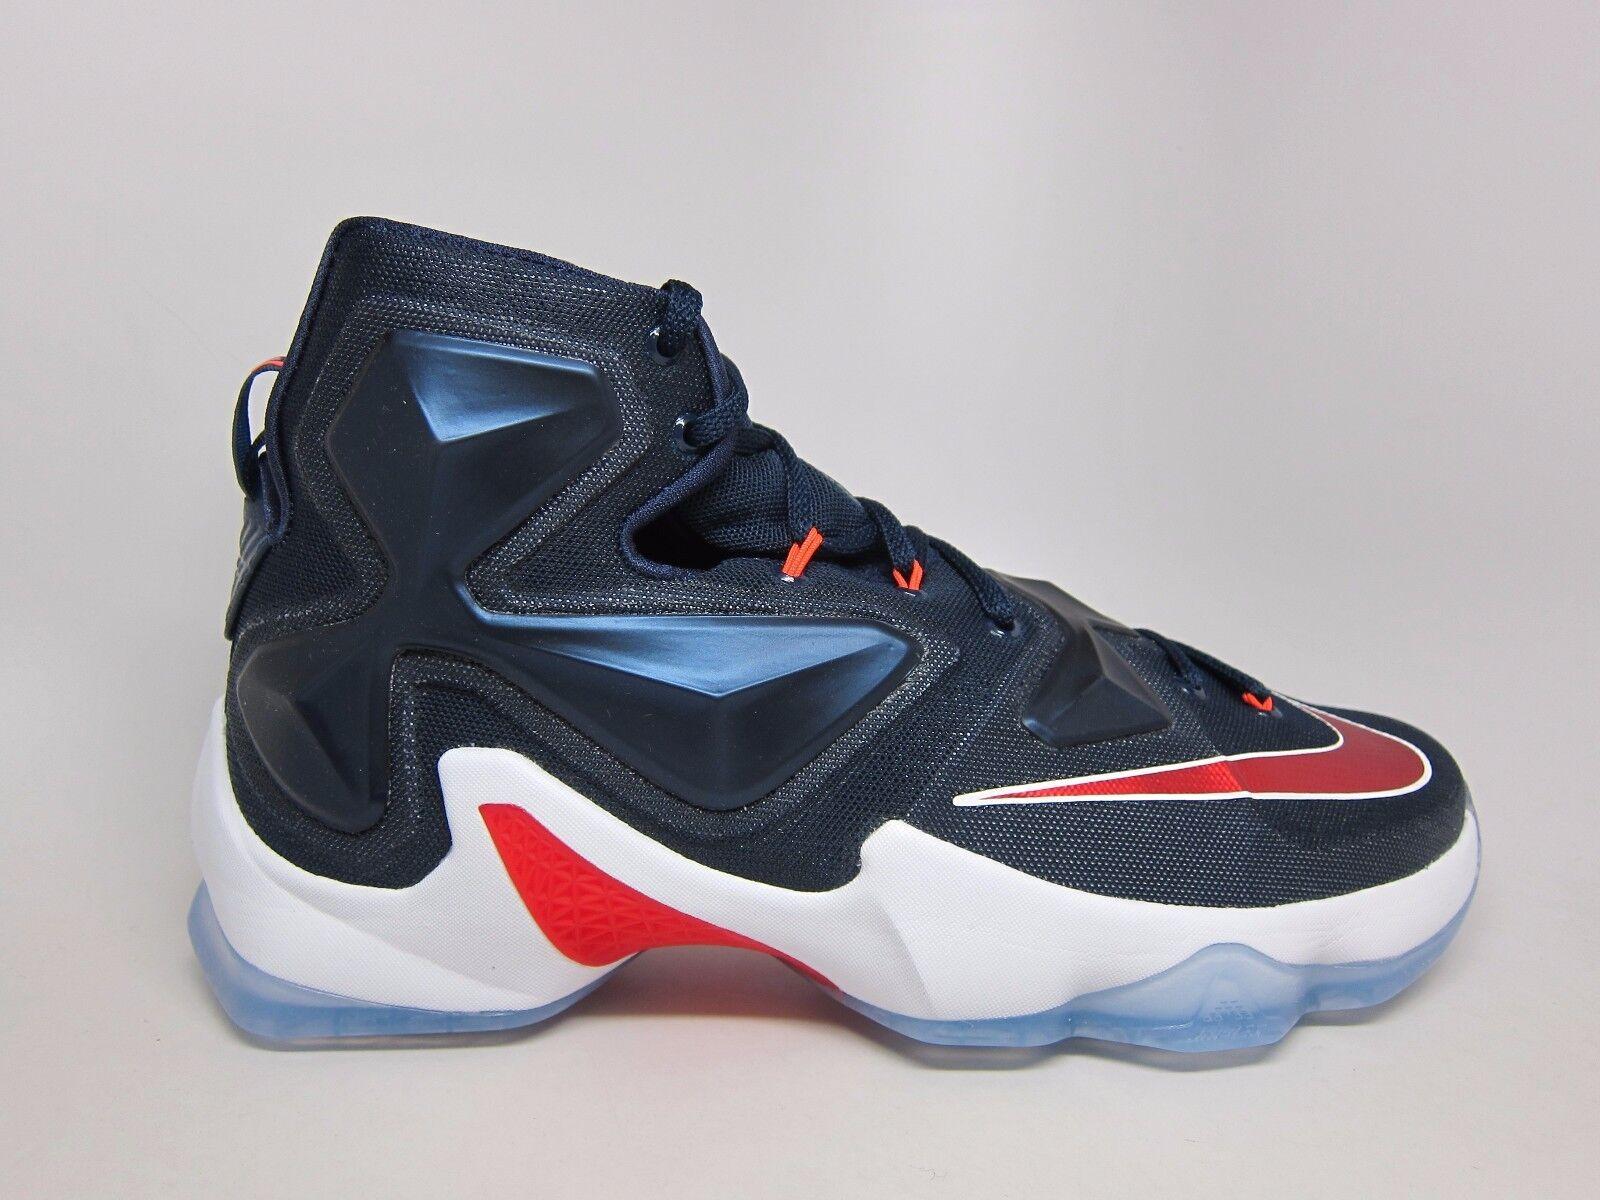 New Men's Nike Lebron XIII USA Shoes (807219-461)  Navy//Varsity Red-White